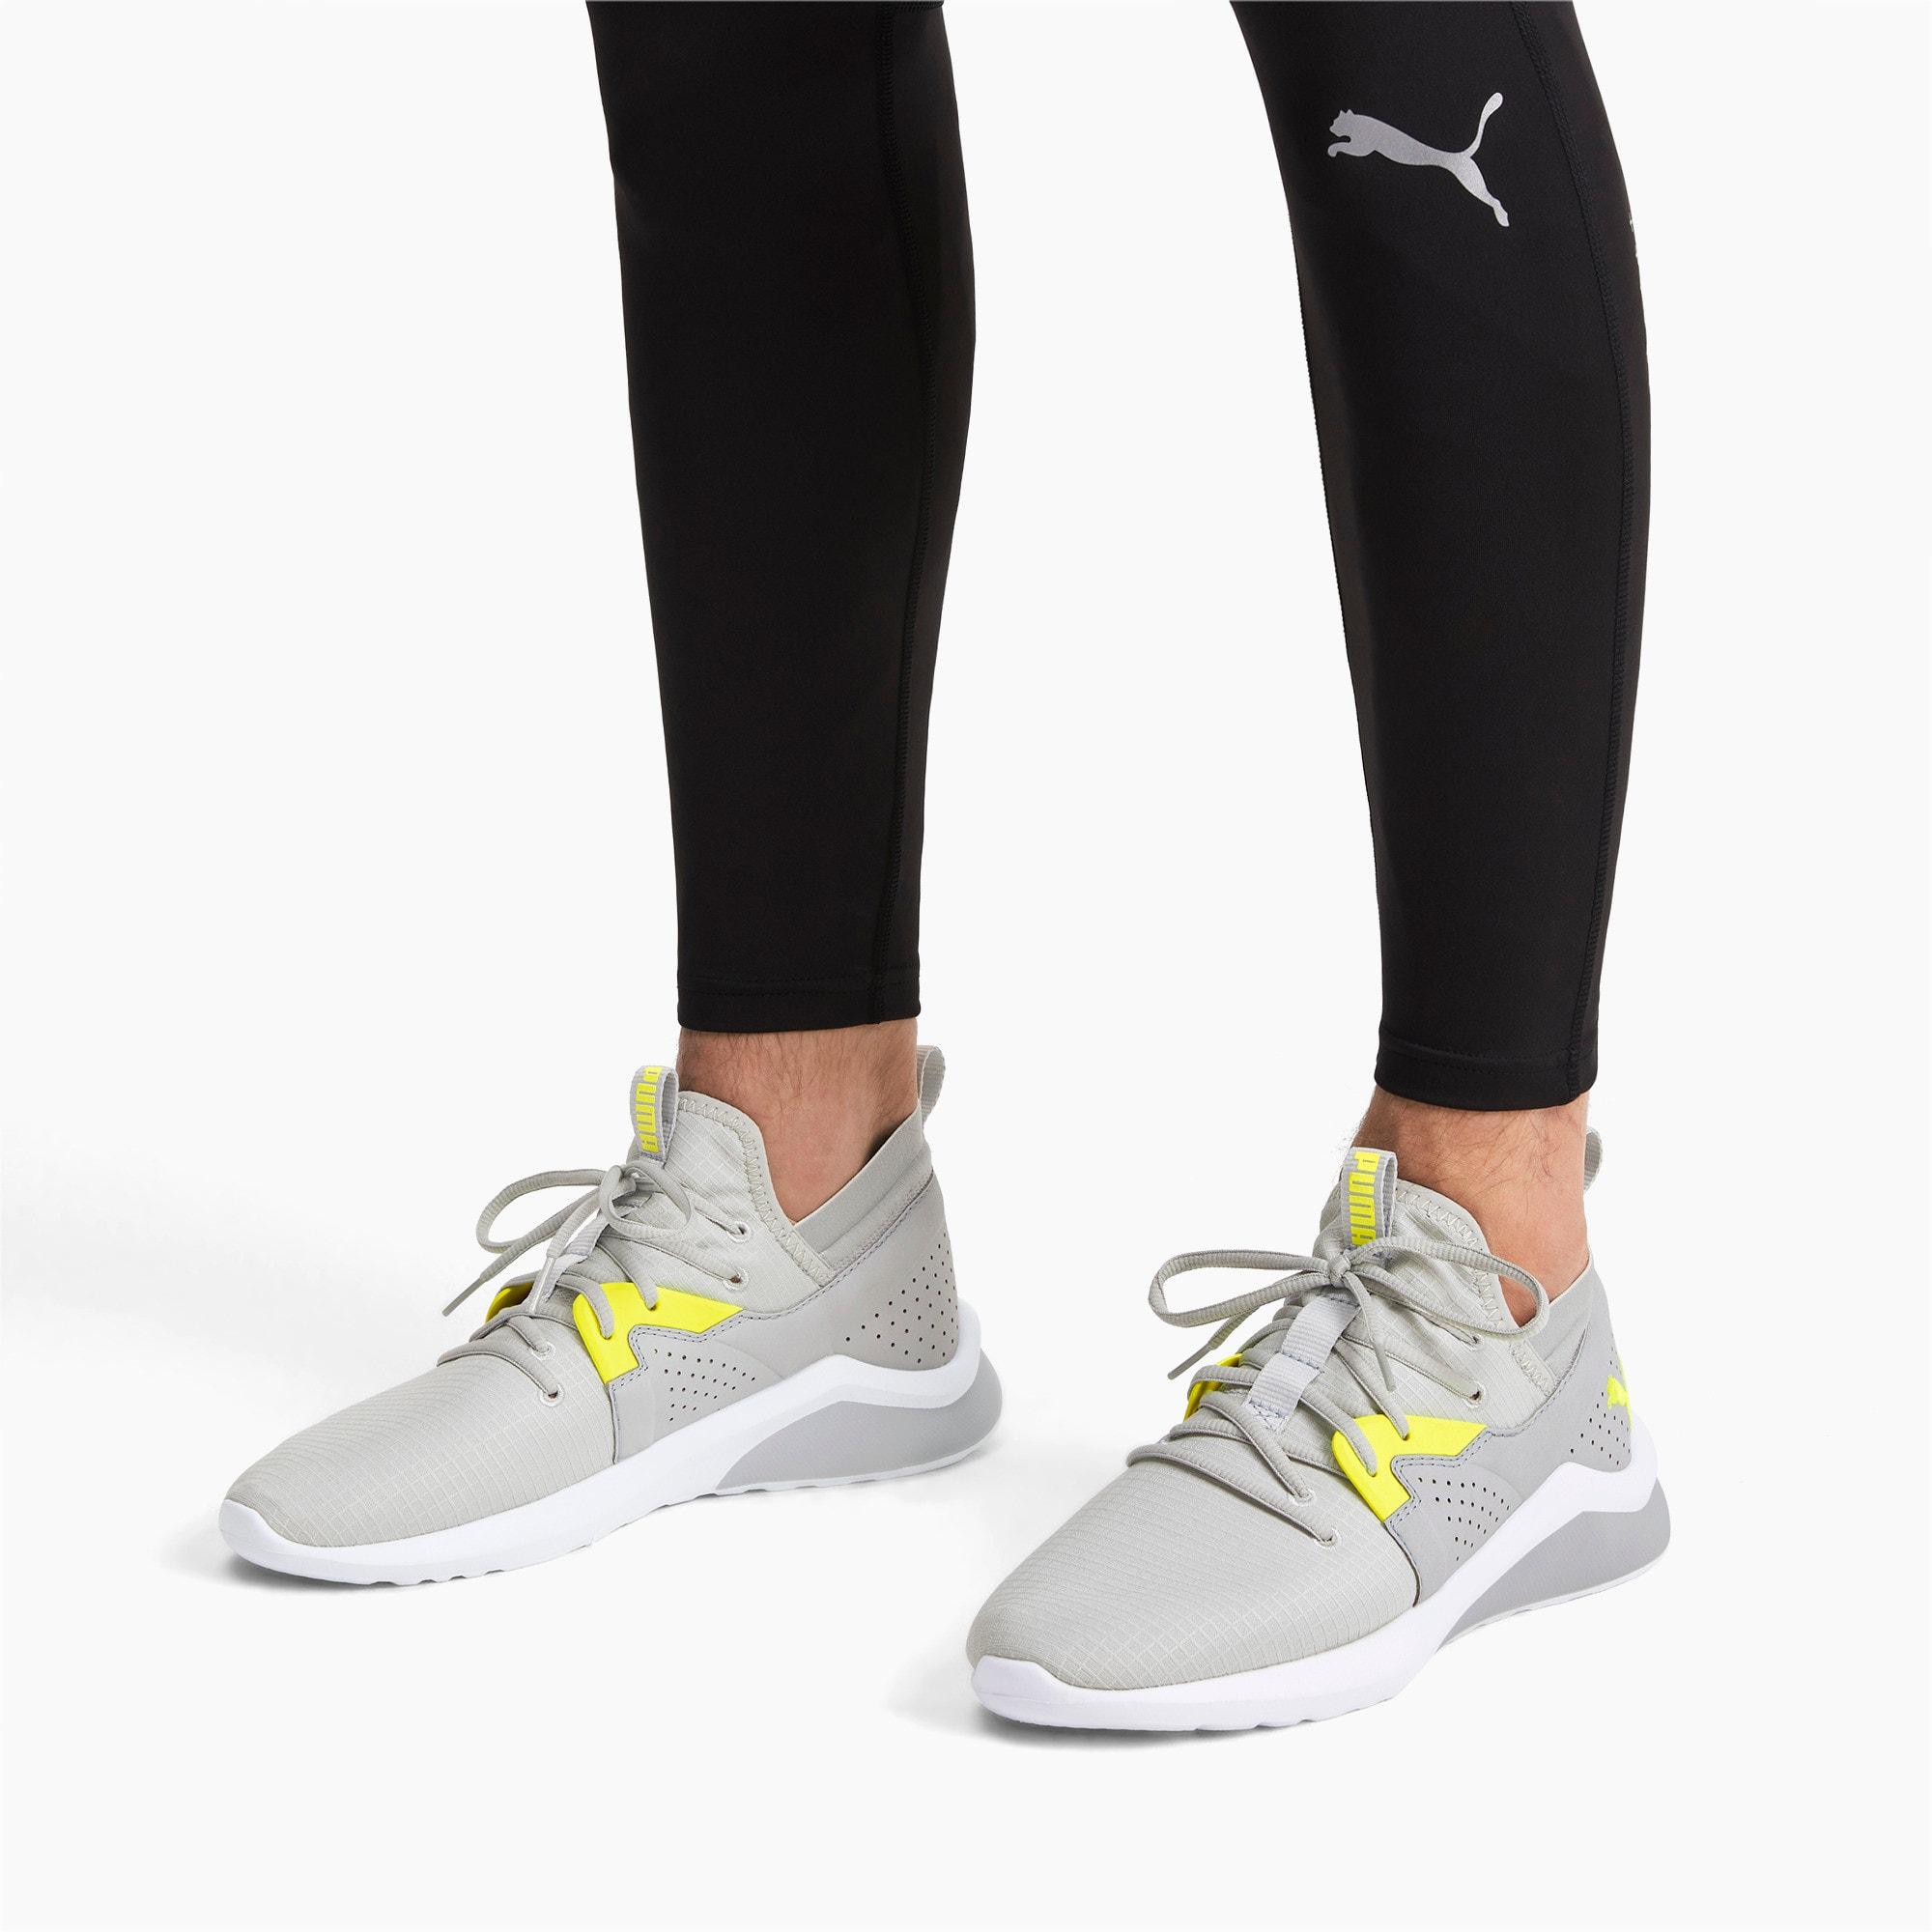 Thumbnail 2 of Emergence Lights Men's Running Shoes, High Rise-Yellow Alert, medium-IND